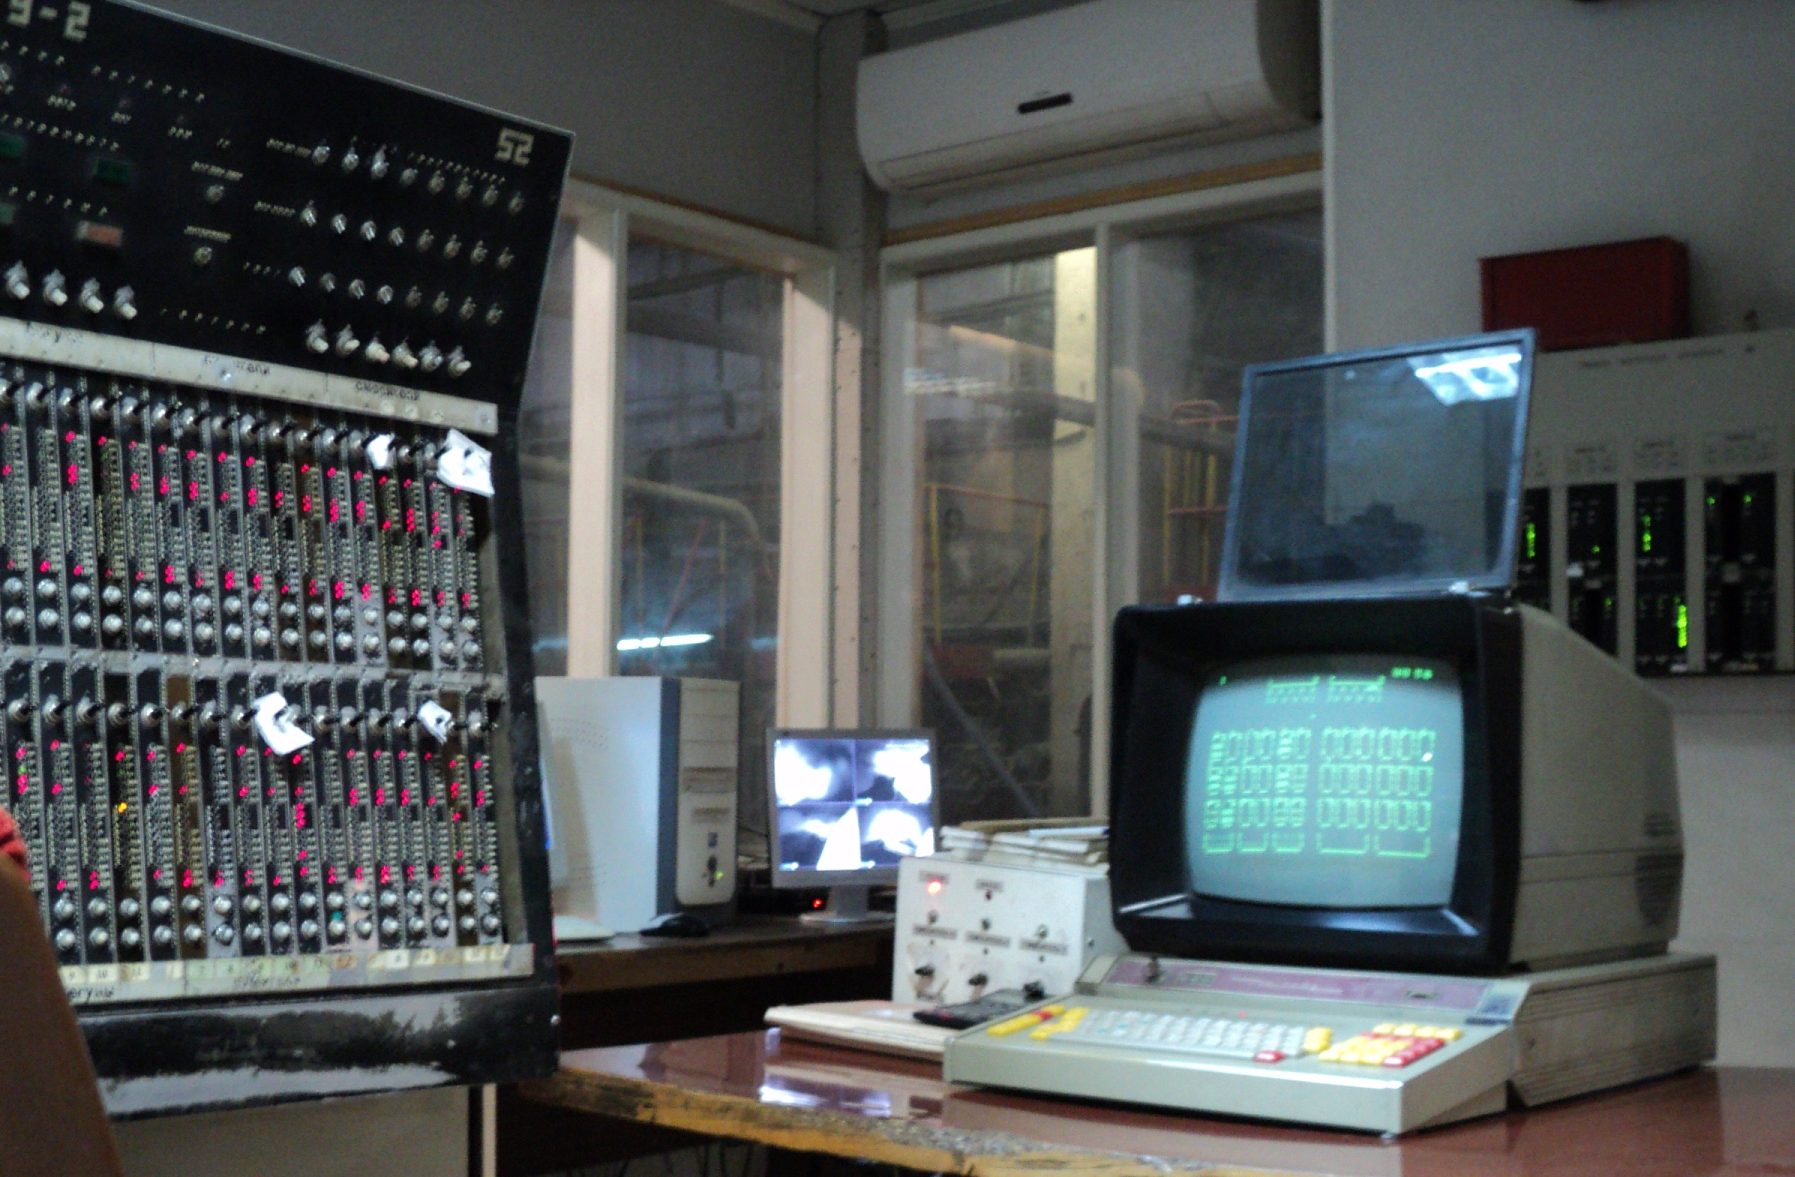 ТС-7063: Вспоминаем 80-е - 5